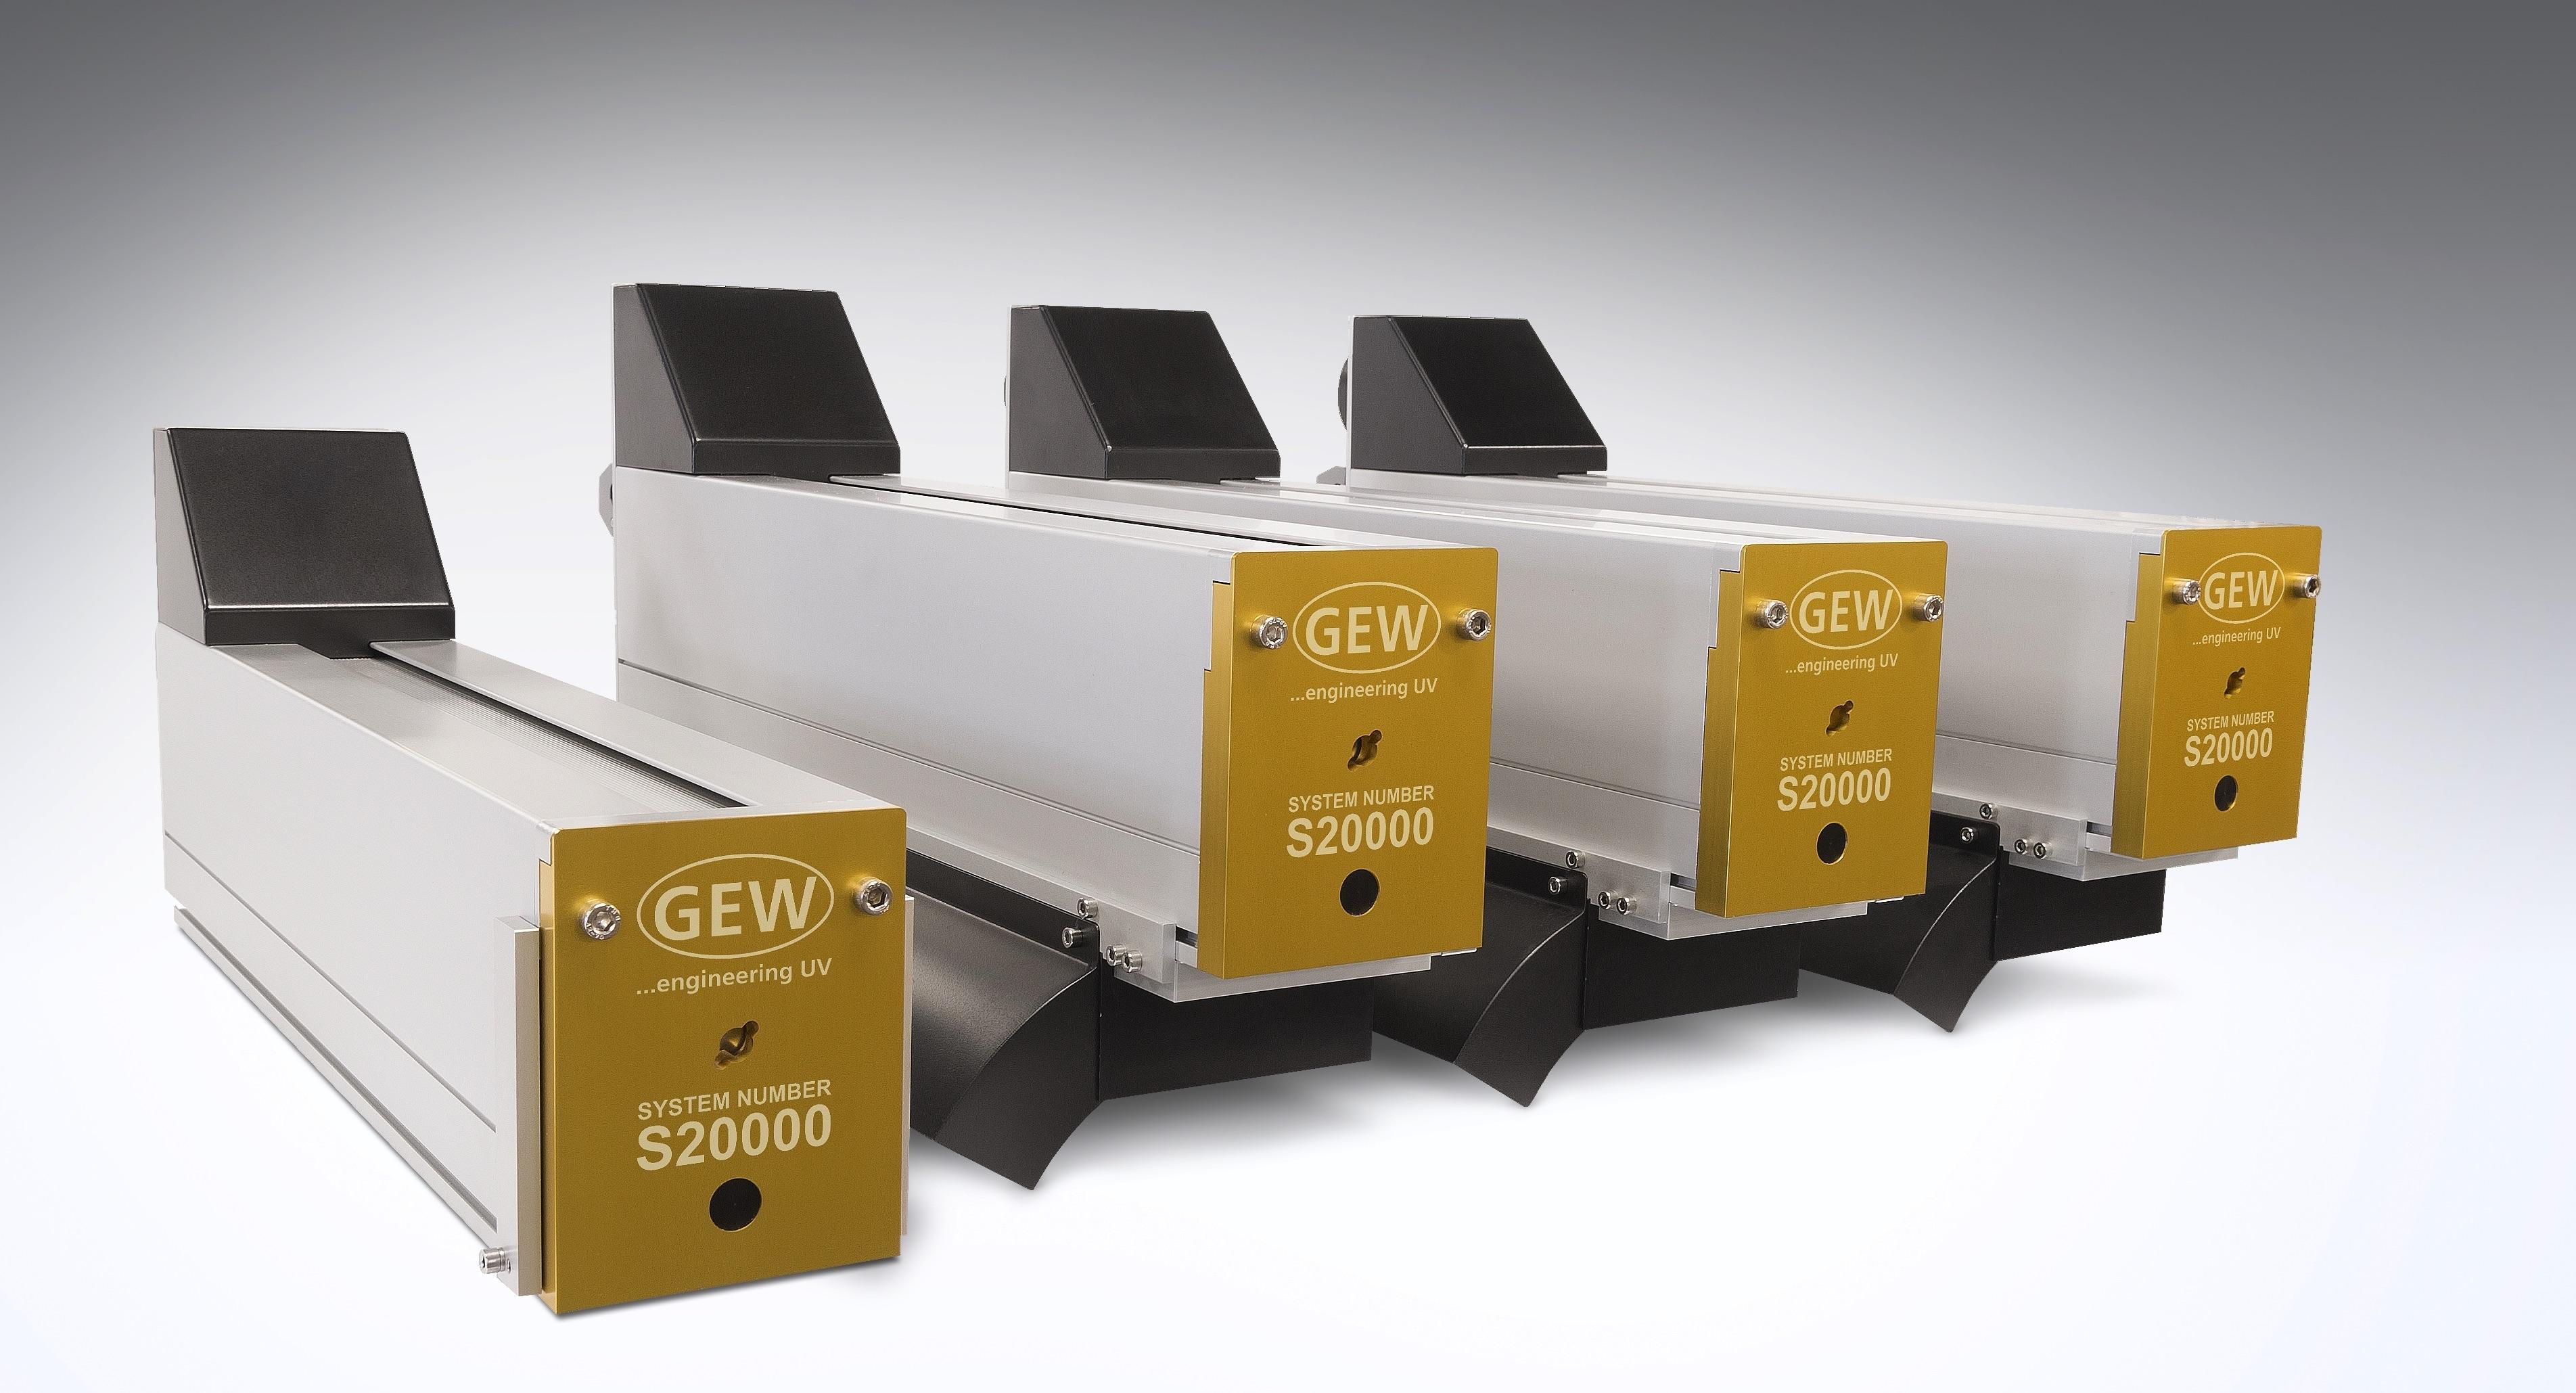 GEW celebrates 20,000th installation